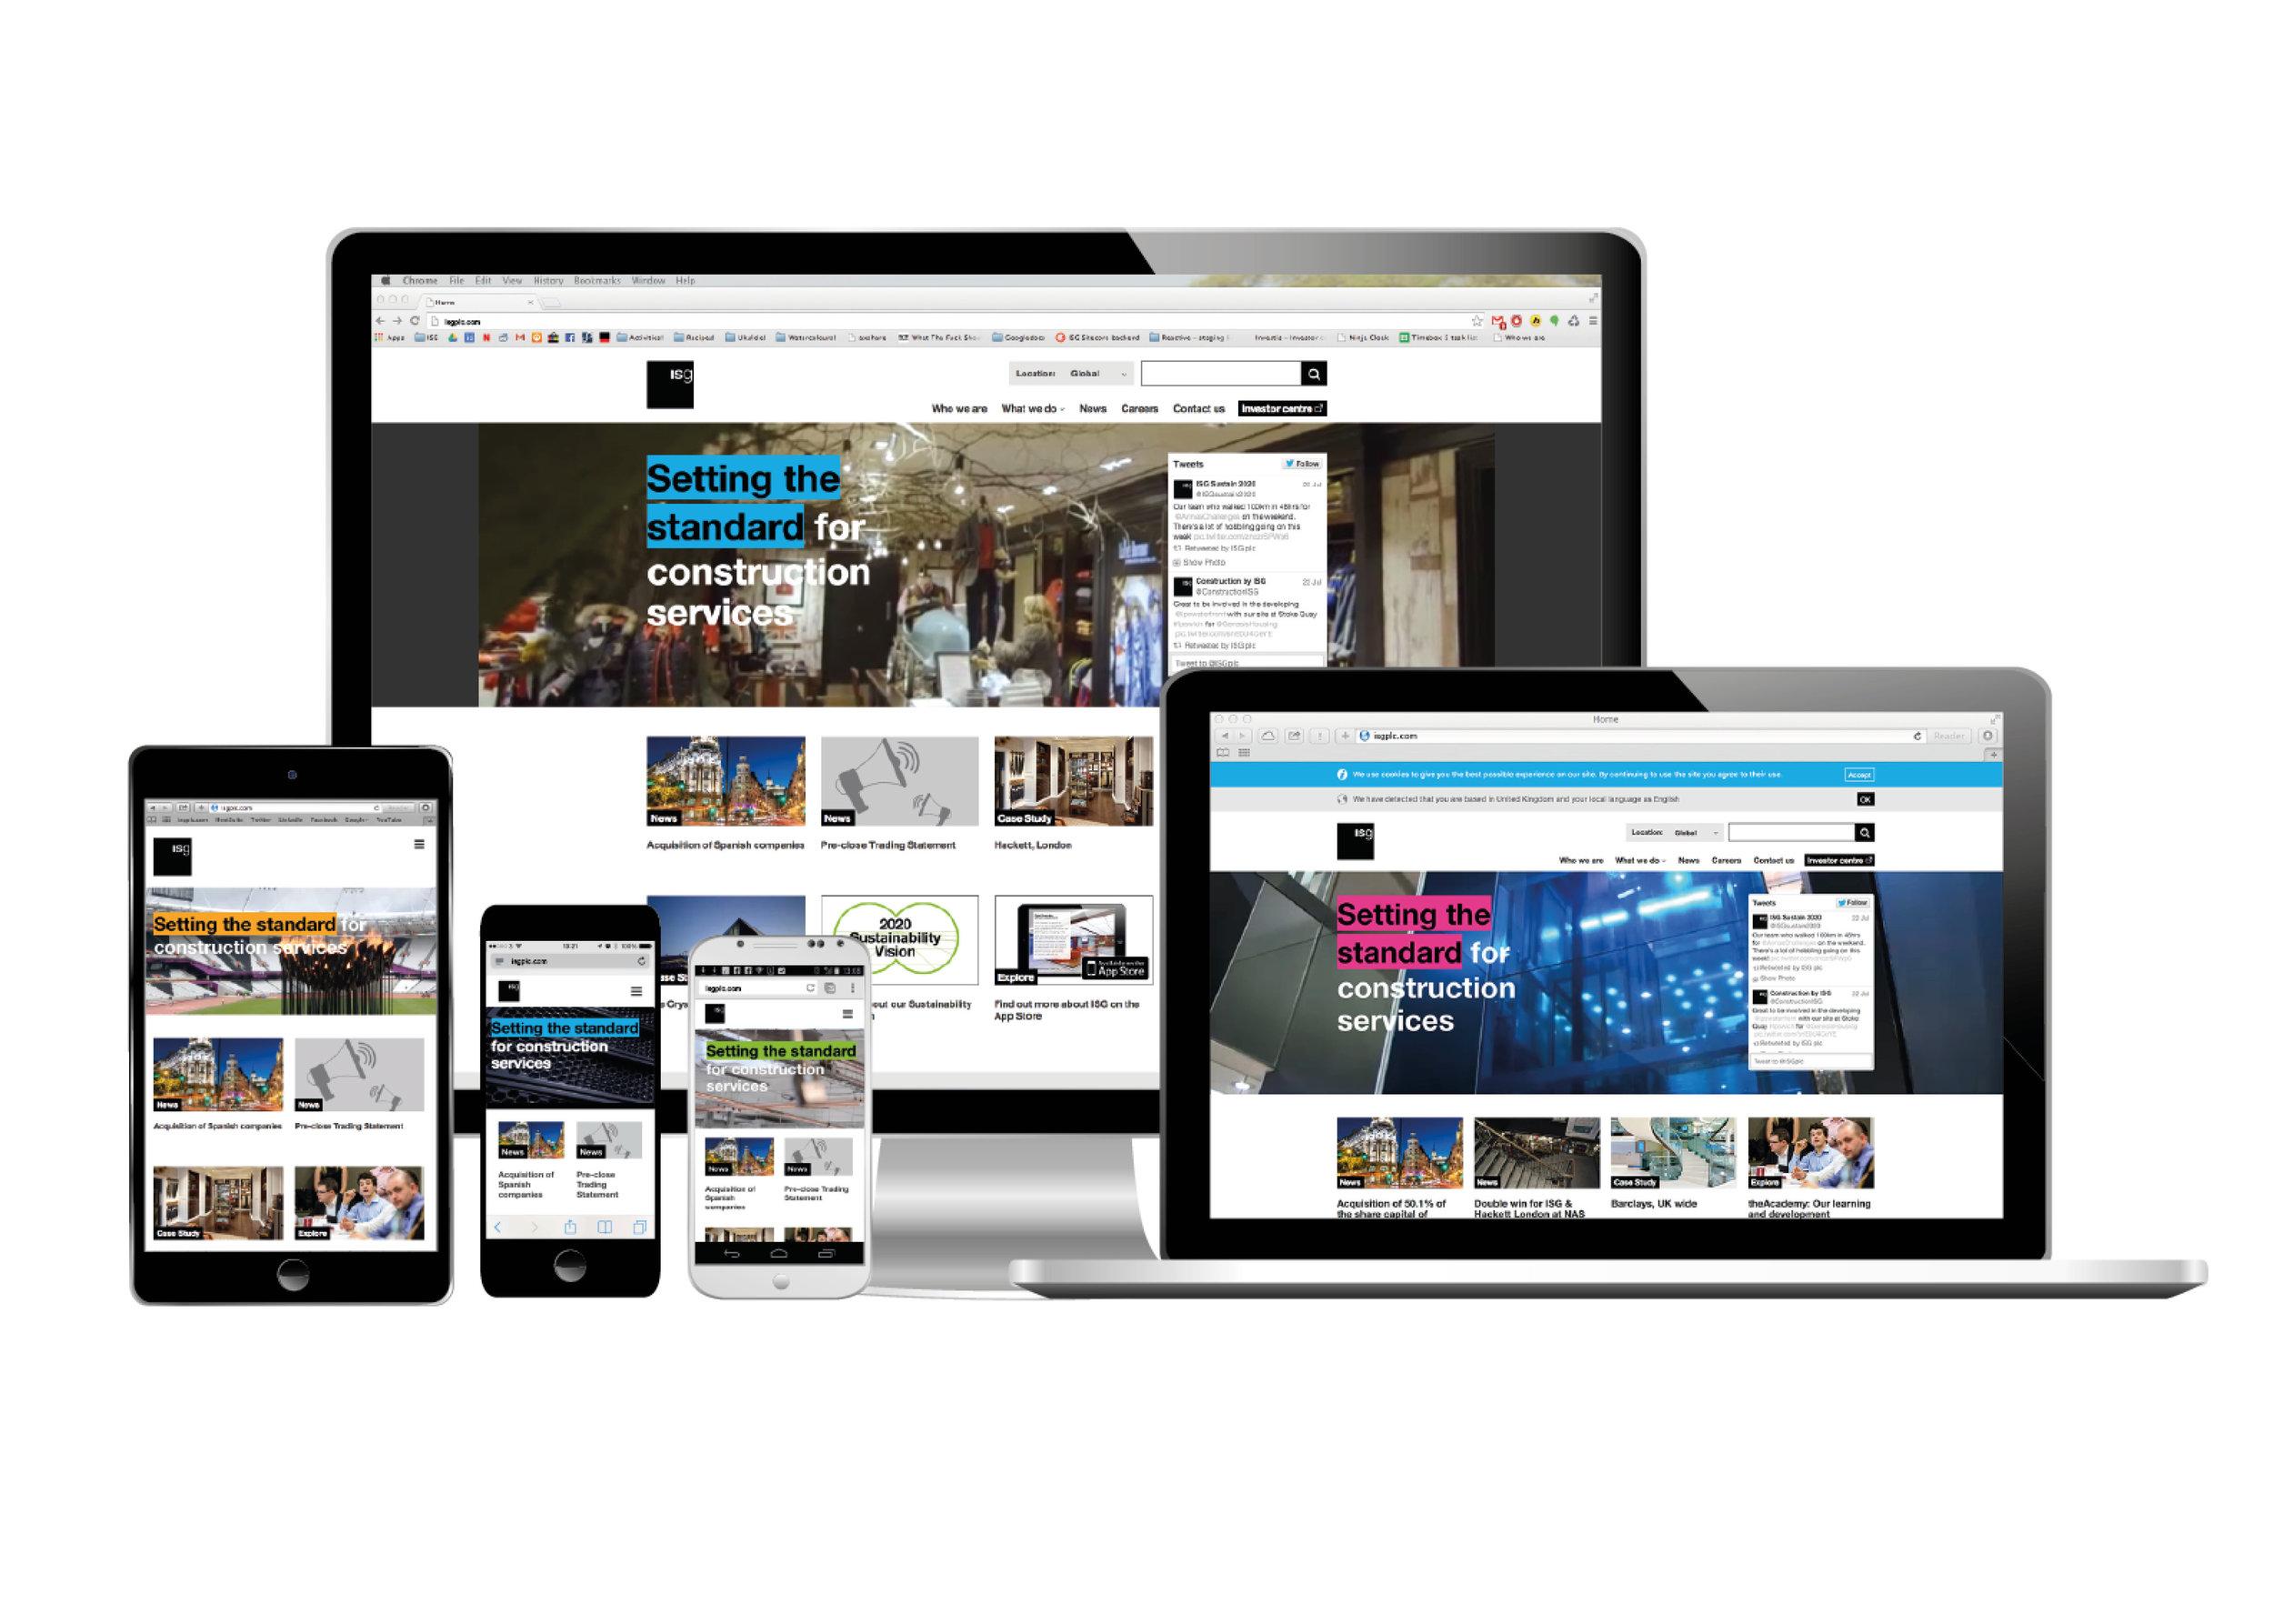 ISG_Best_Use_Of_Website22_4134.jpg